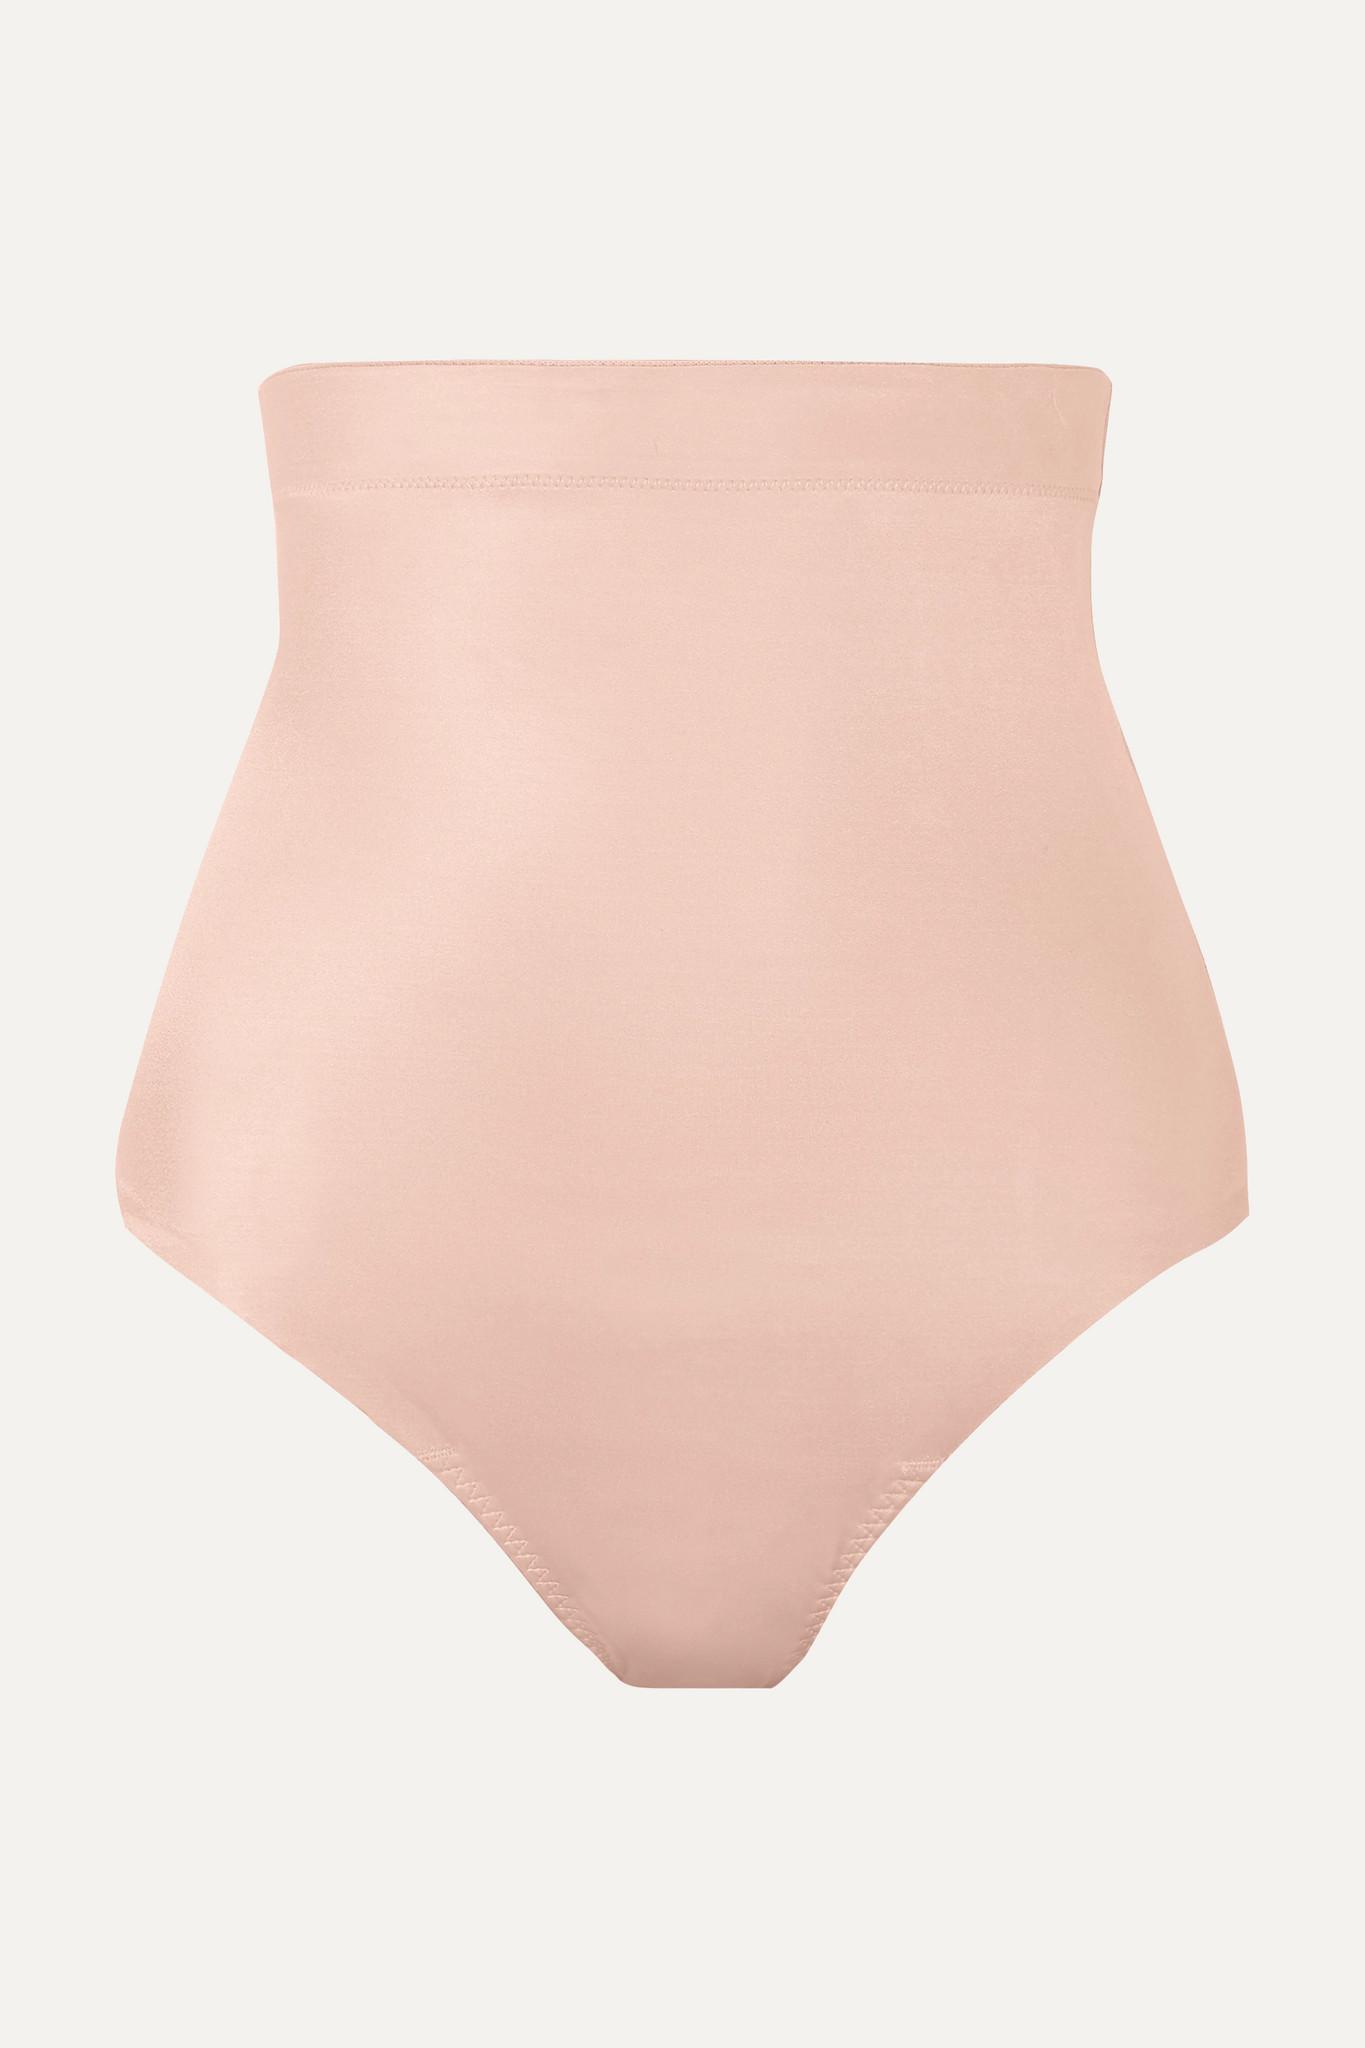 SPANX - Suit Your Fancy 高腰弹力平纹布丁字裤 - 中性色 - x large